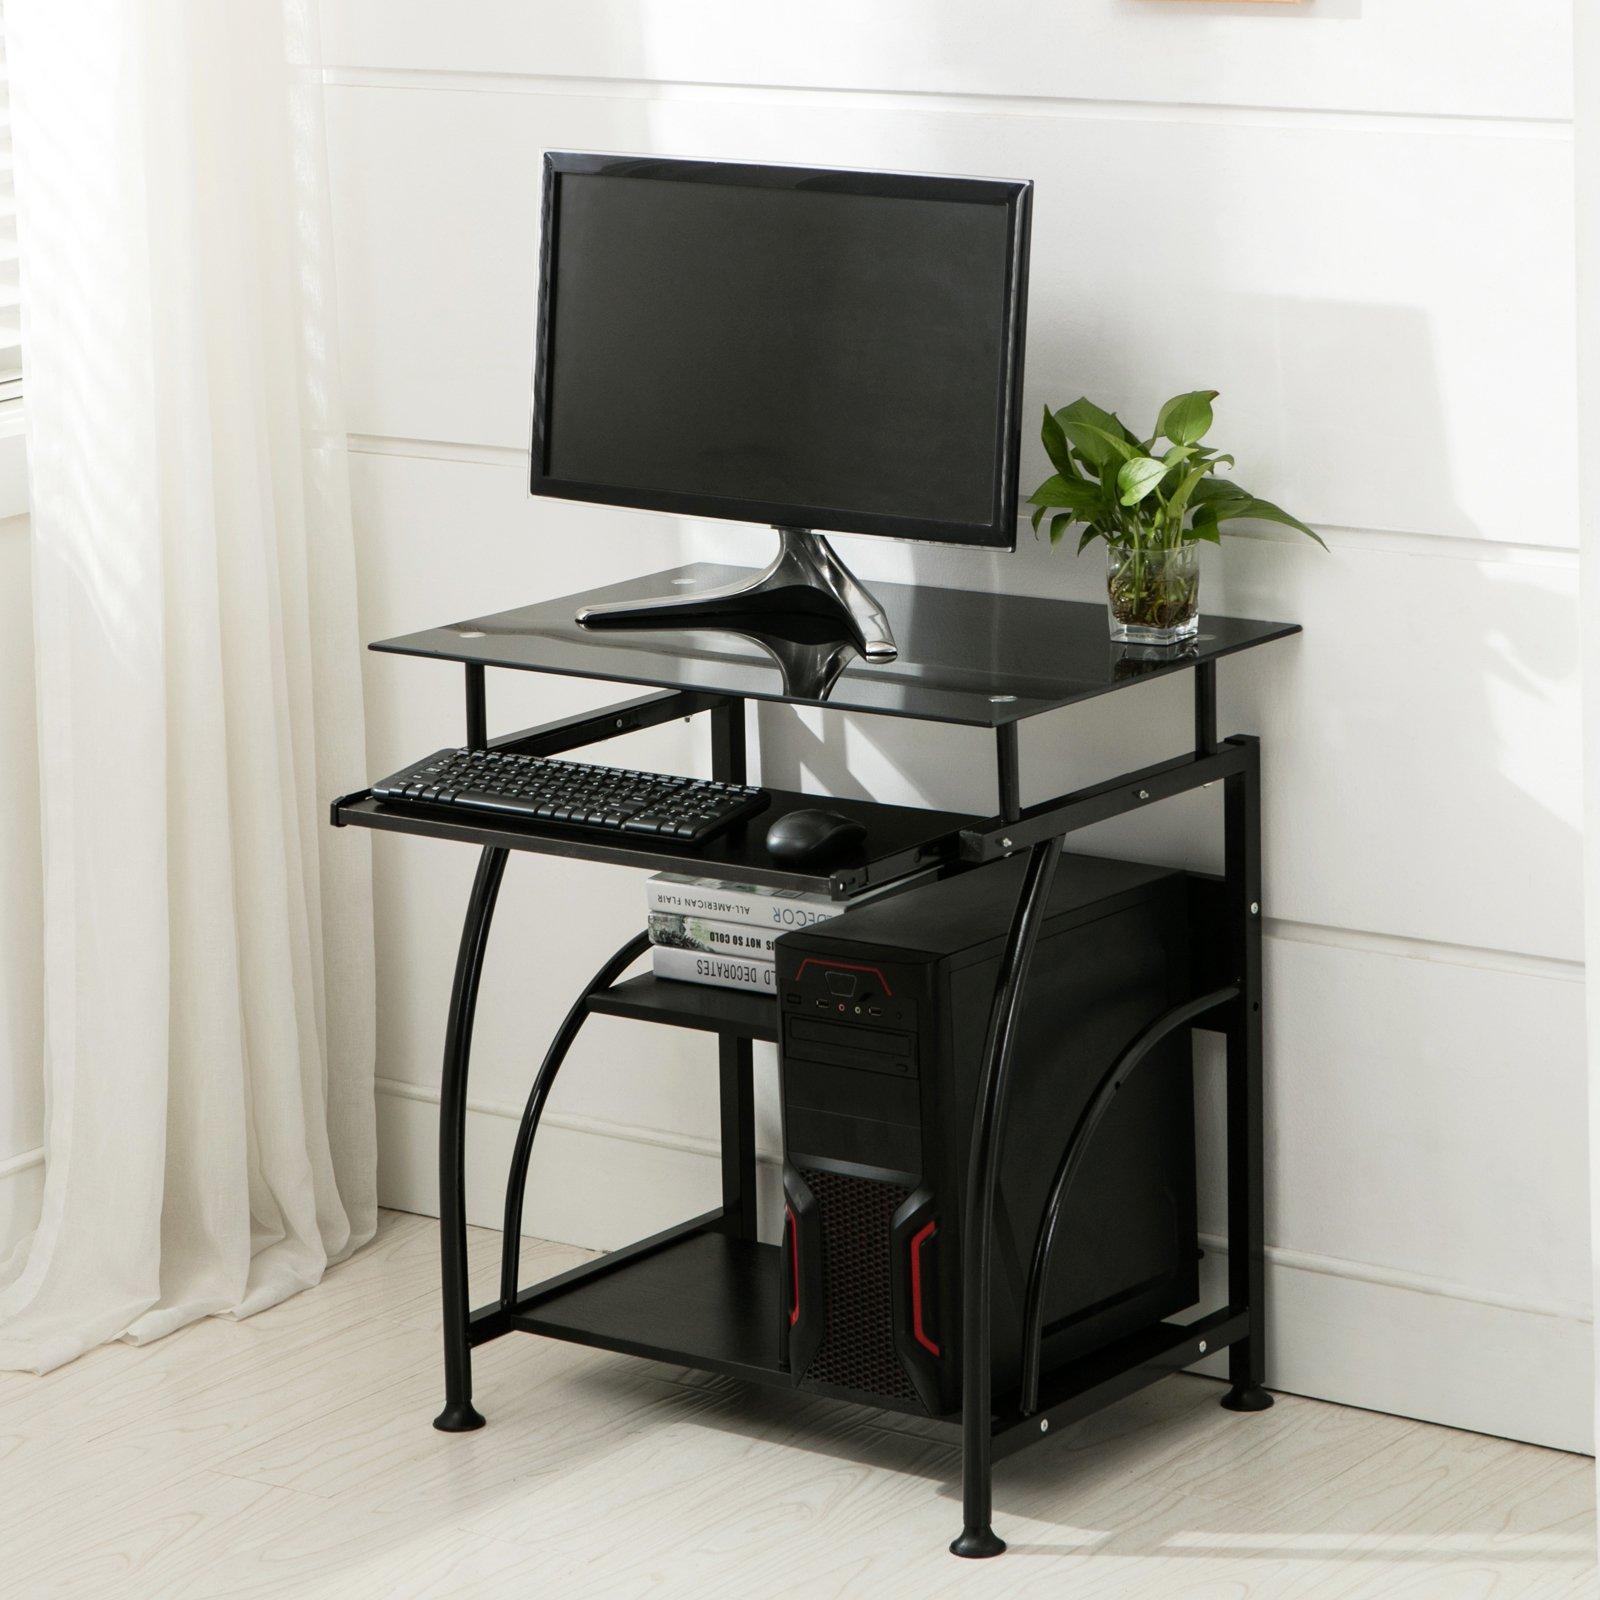 Mecor Computer Desk Home Office PC Laptop Table Workstation Furniture